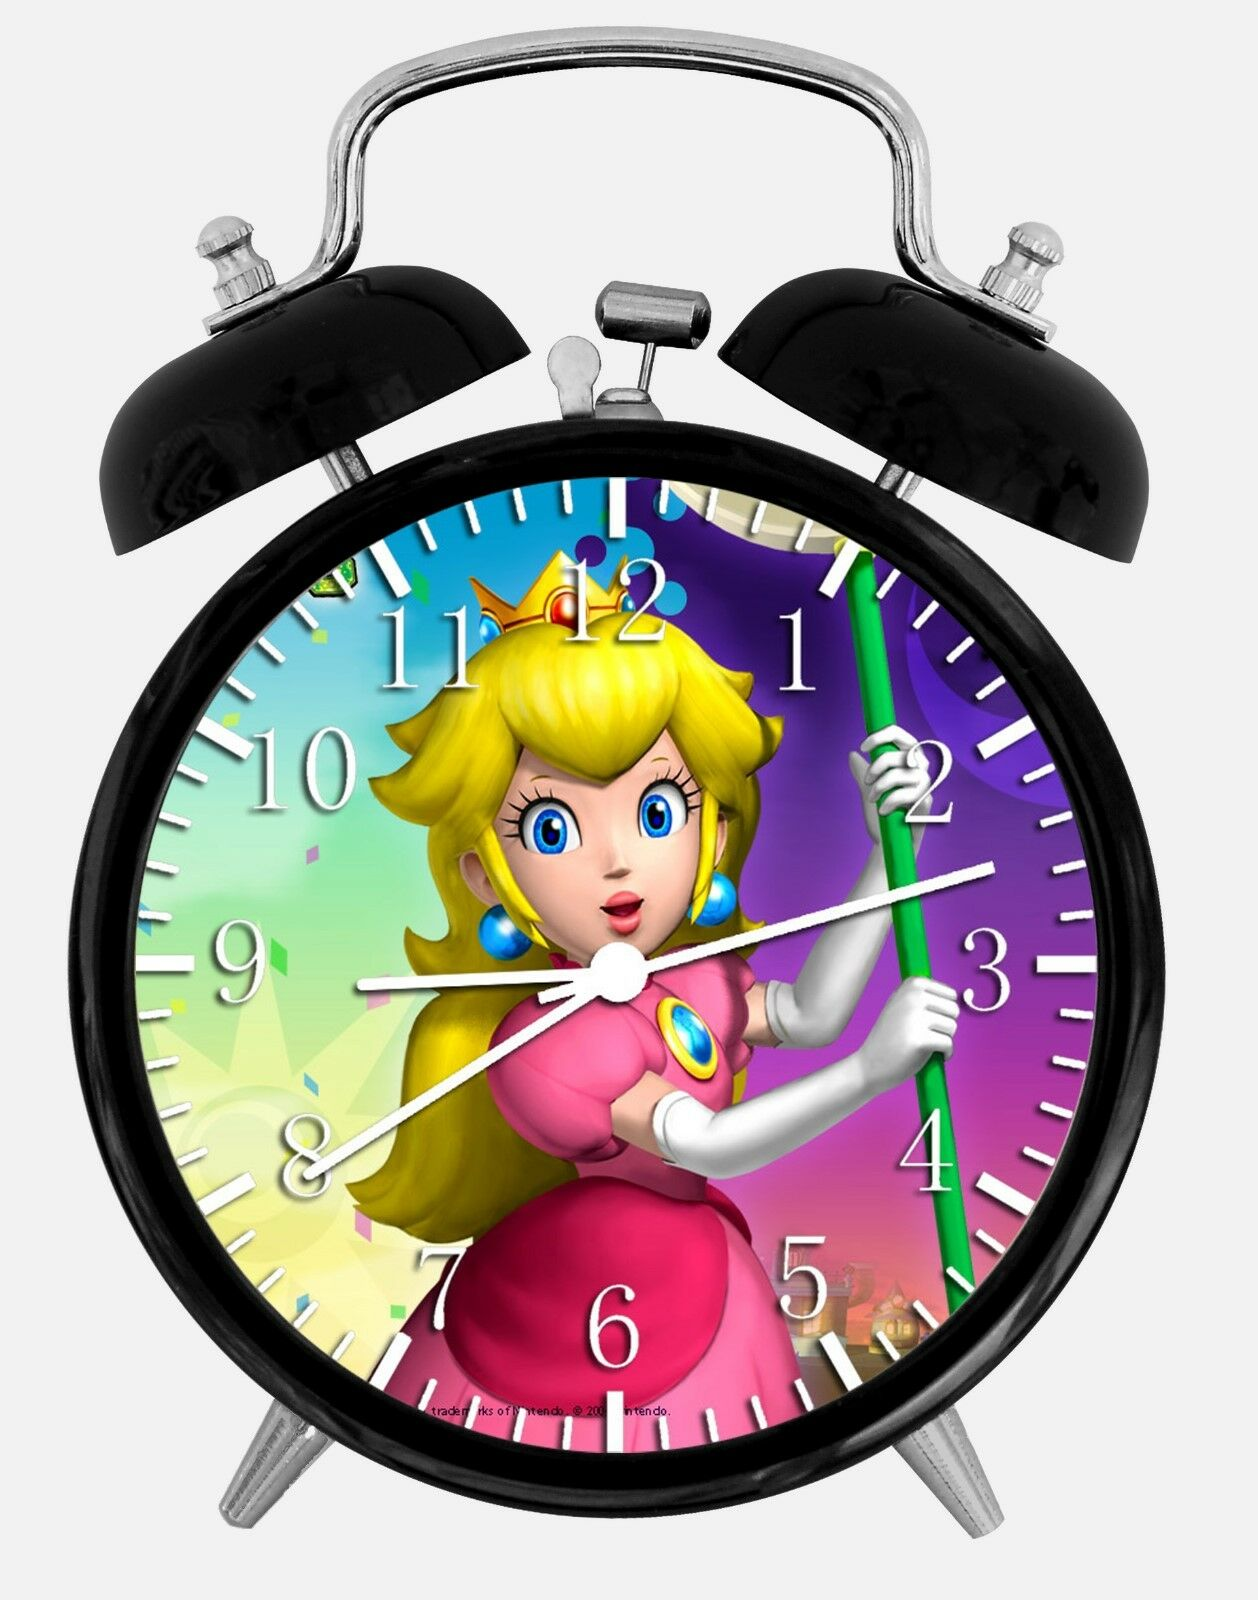 "Super Mario Peach Alarm Desk Clock 3.75"" Room Office Decor W146 Nice For Gift"